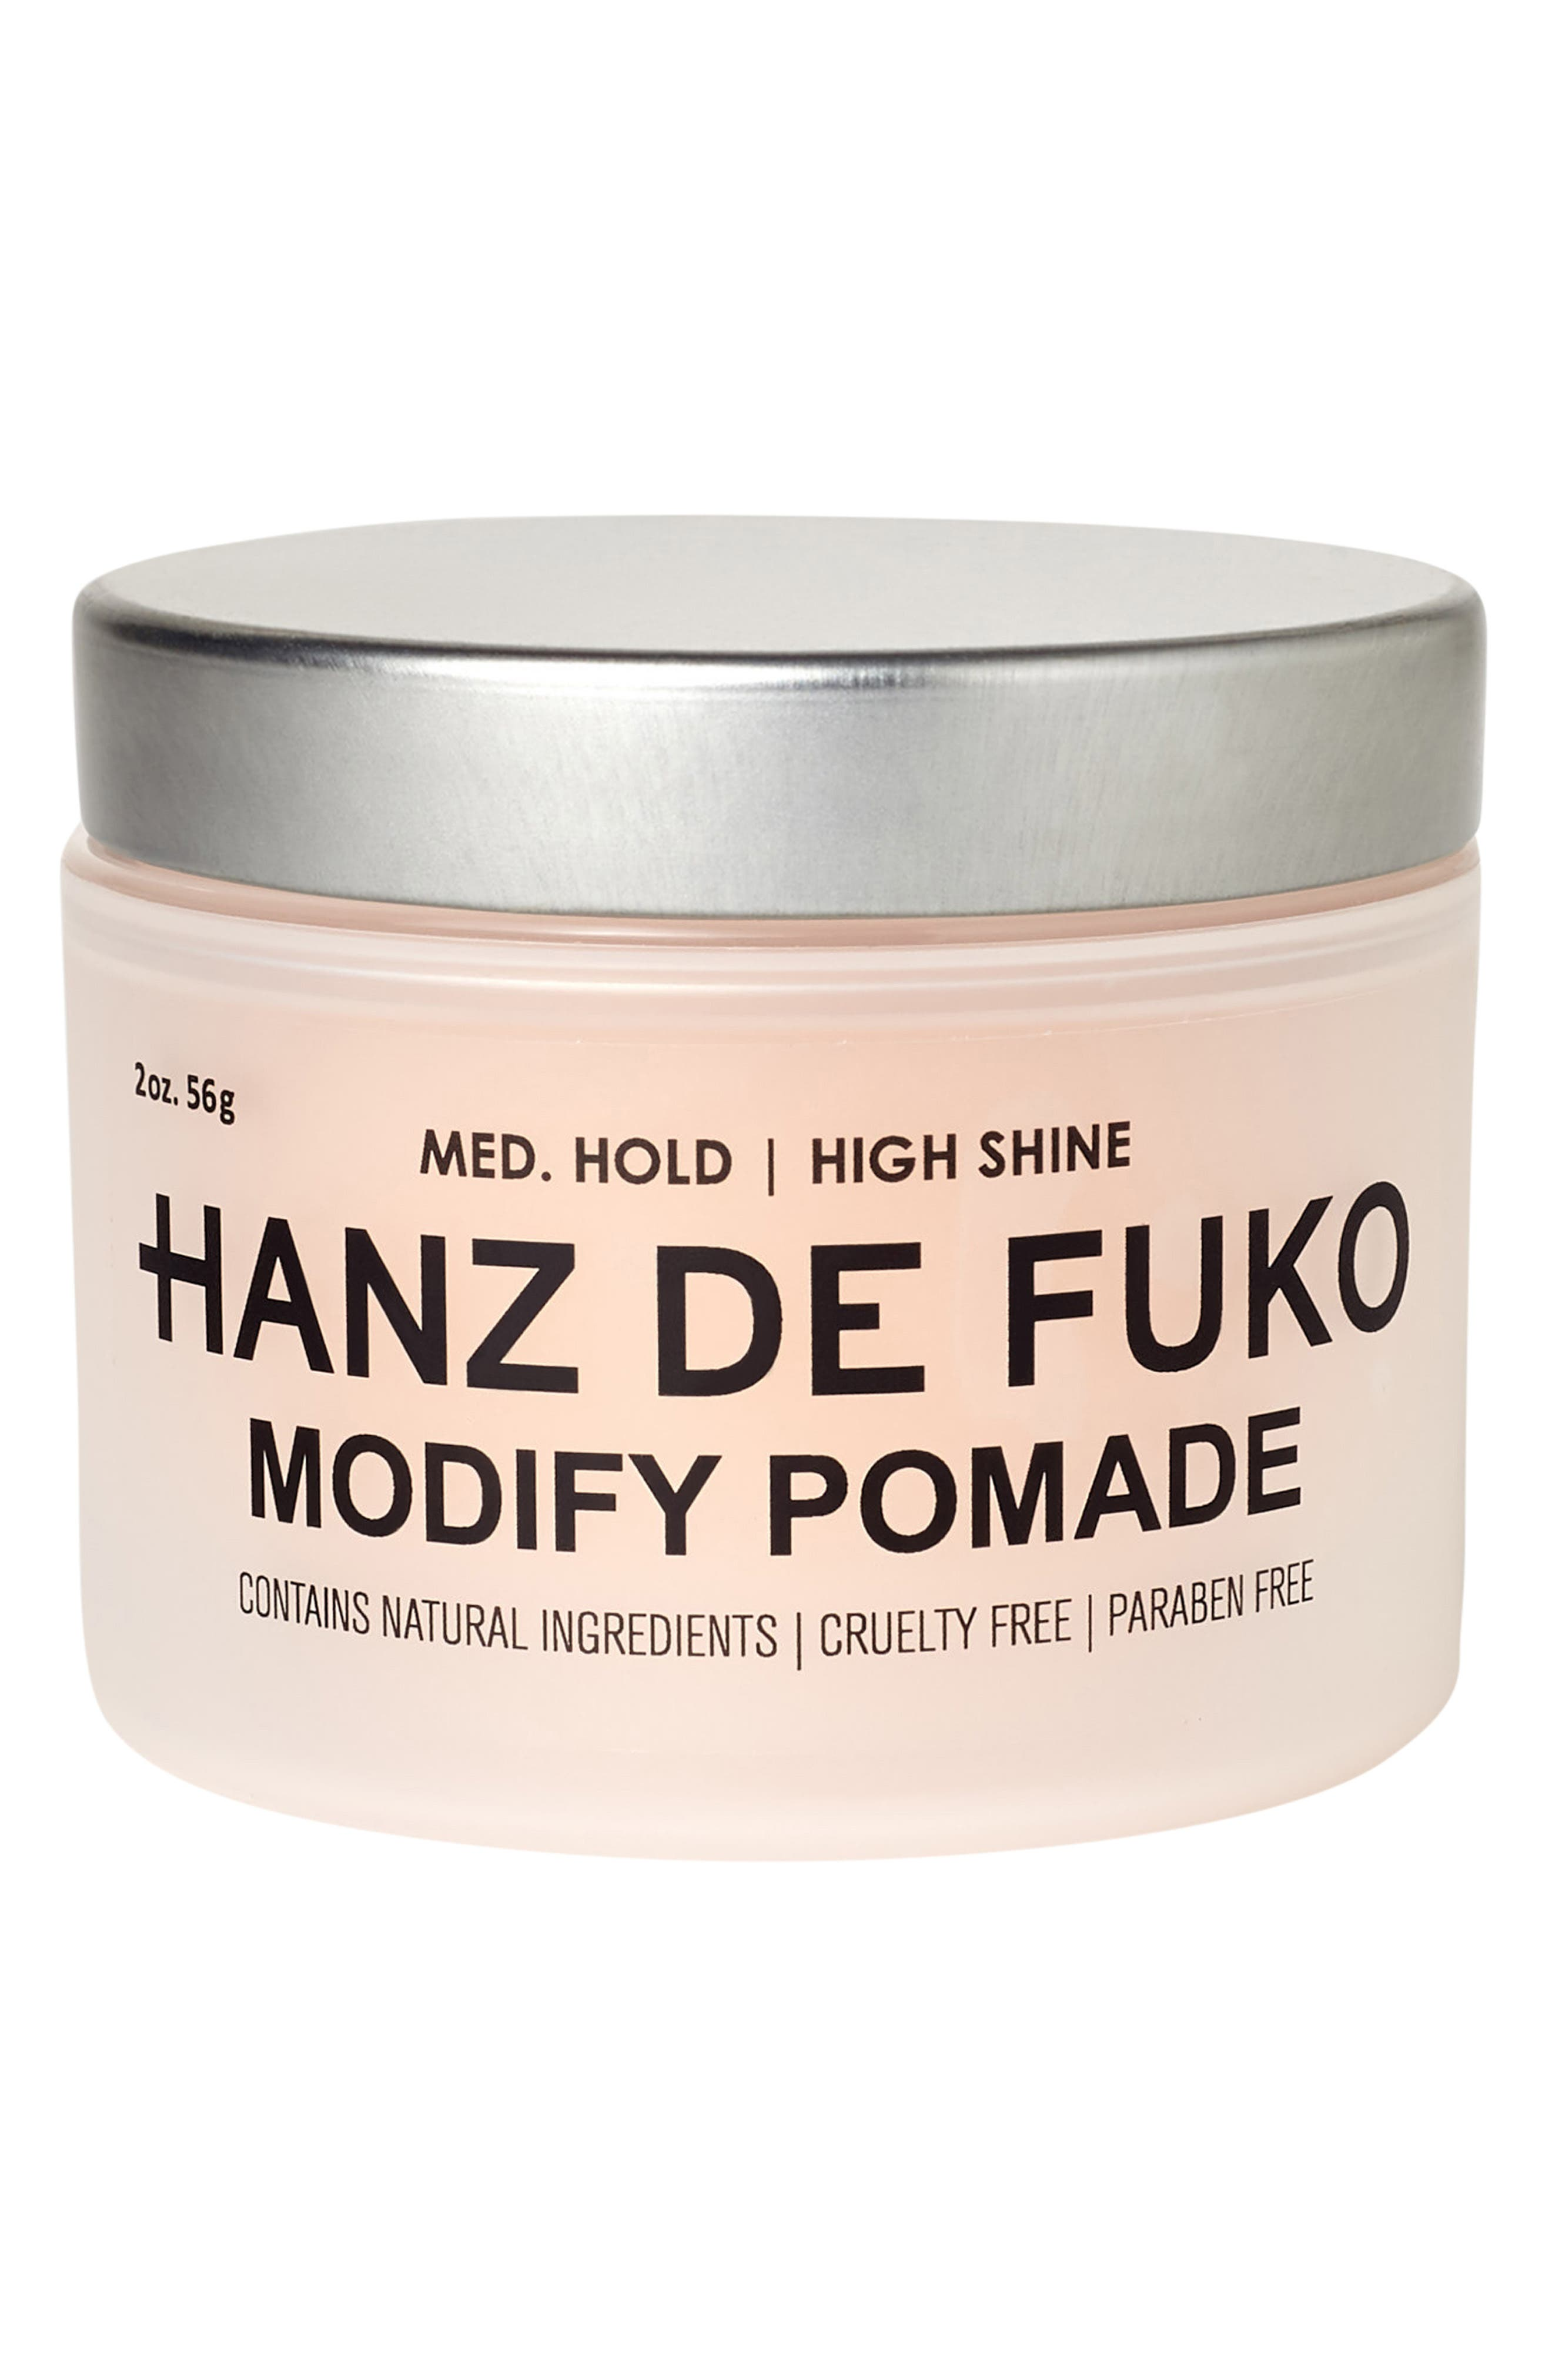 Modify Pomade